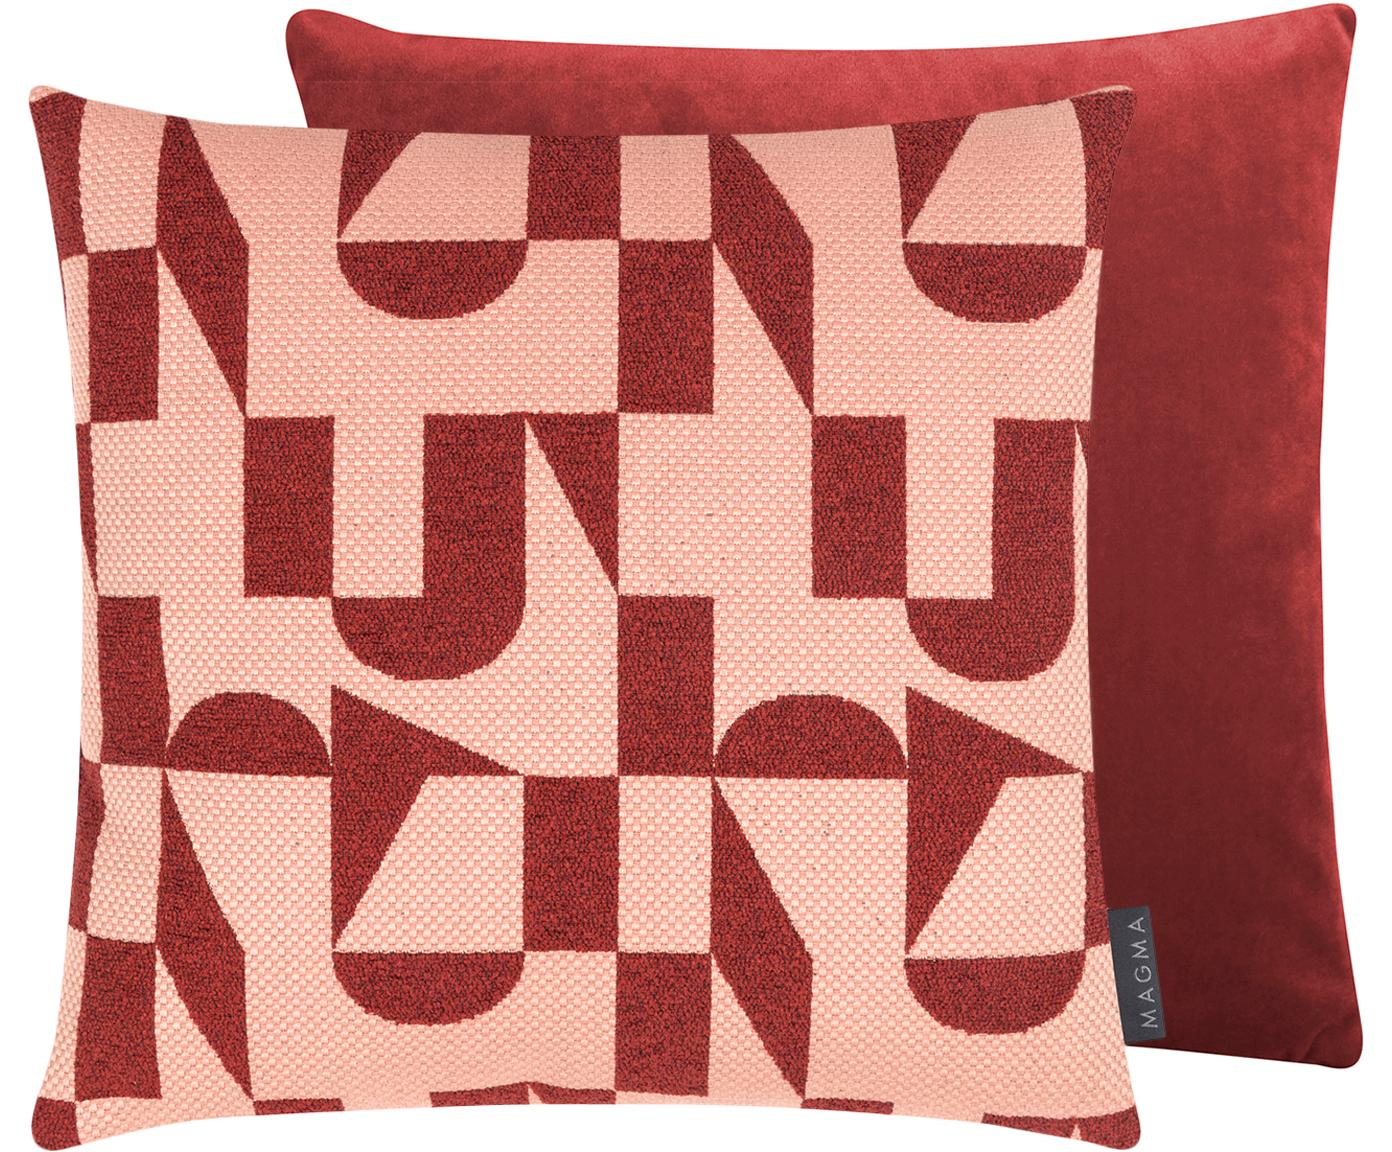 Funda de cojín, caras distintas Abigail, Parte superior: jacquard (48%poliéster, , Parte trasera: terciopelo de poliéster, Rosa, rojo cobrizo, An 40 x L 40 cm